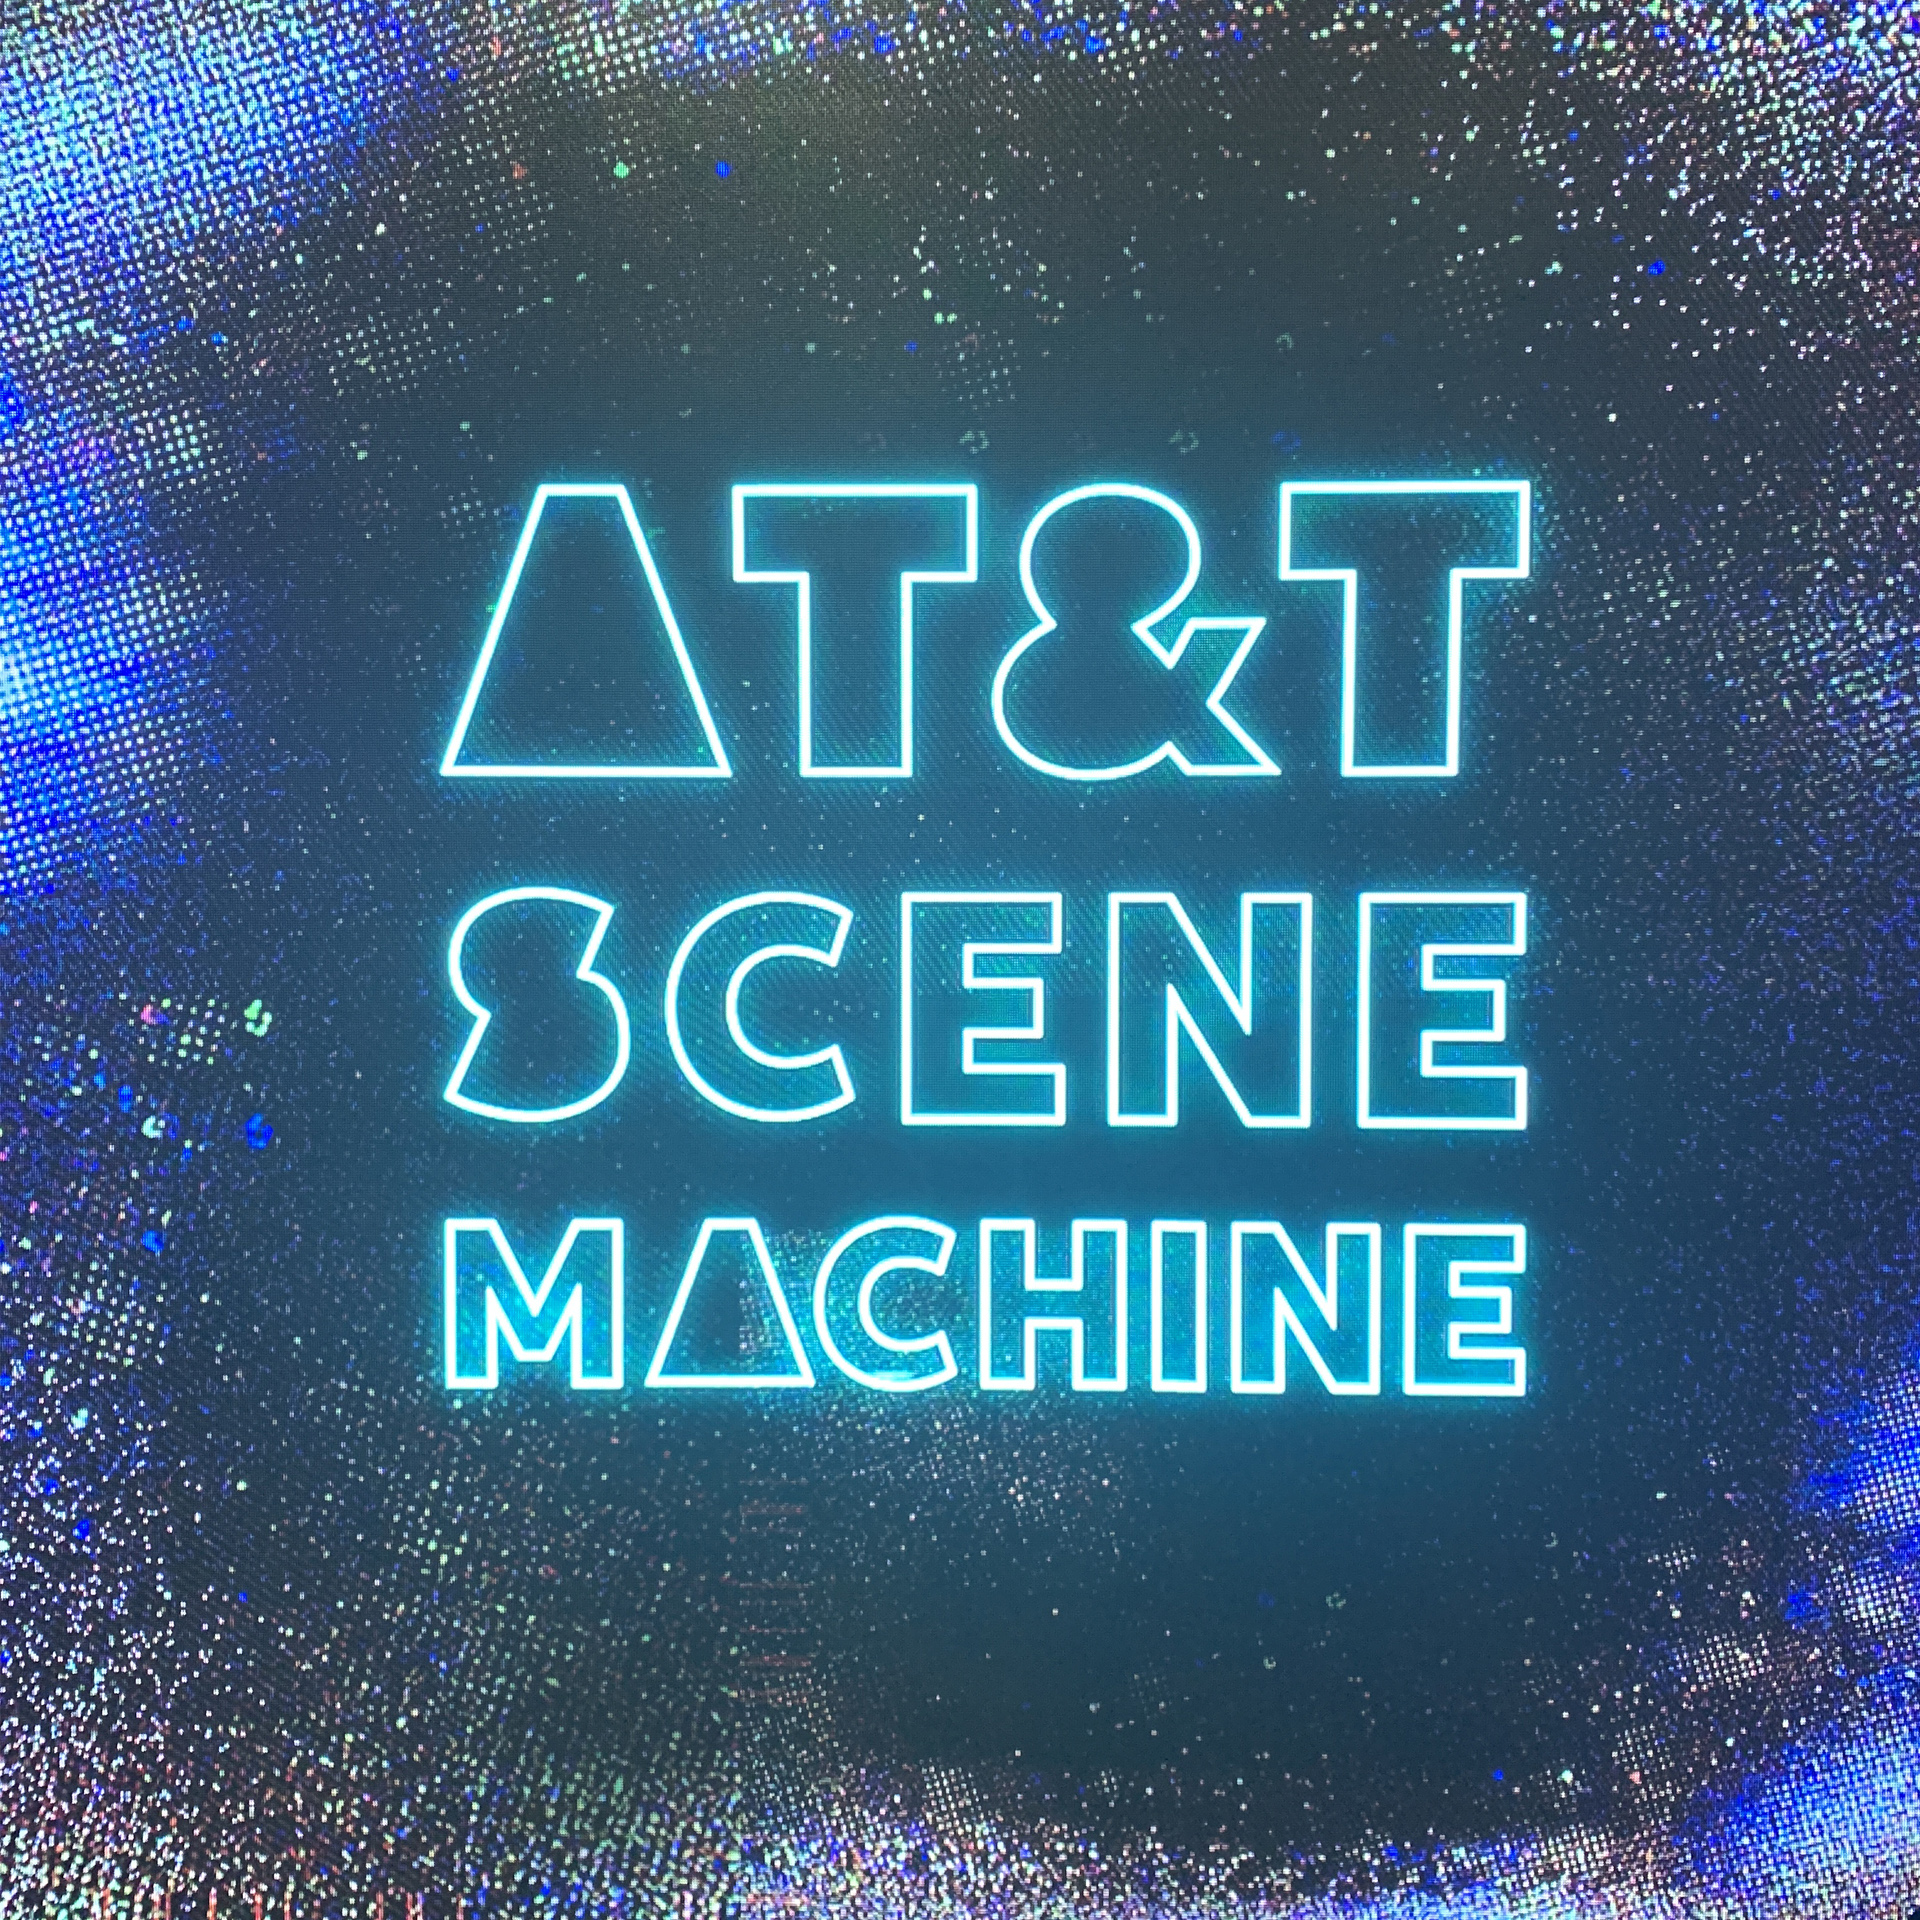 Scene Machine